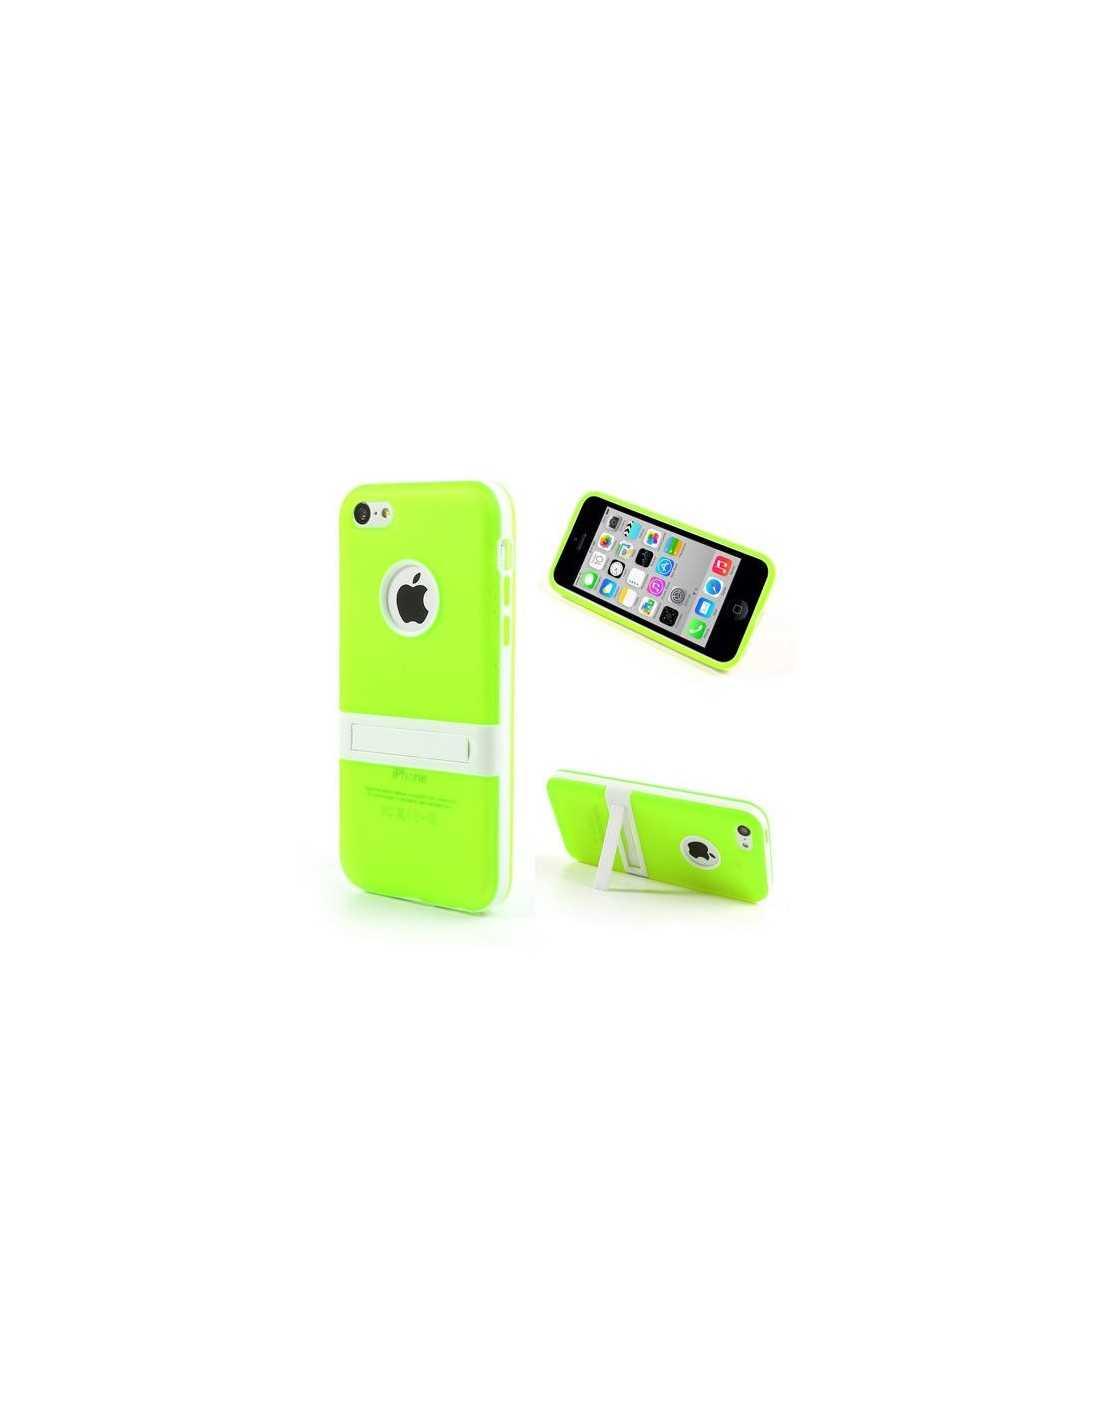 Coque Apple iPhone 5C silicone Hybride Vert